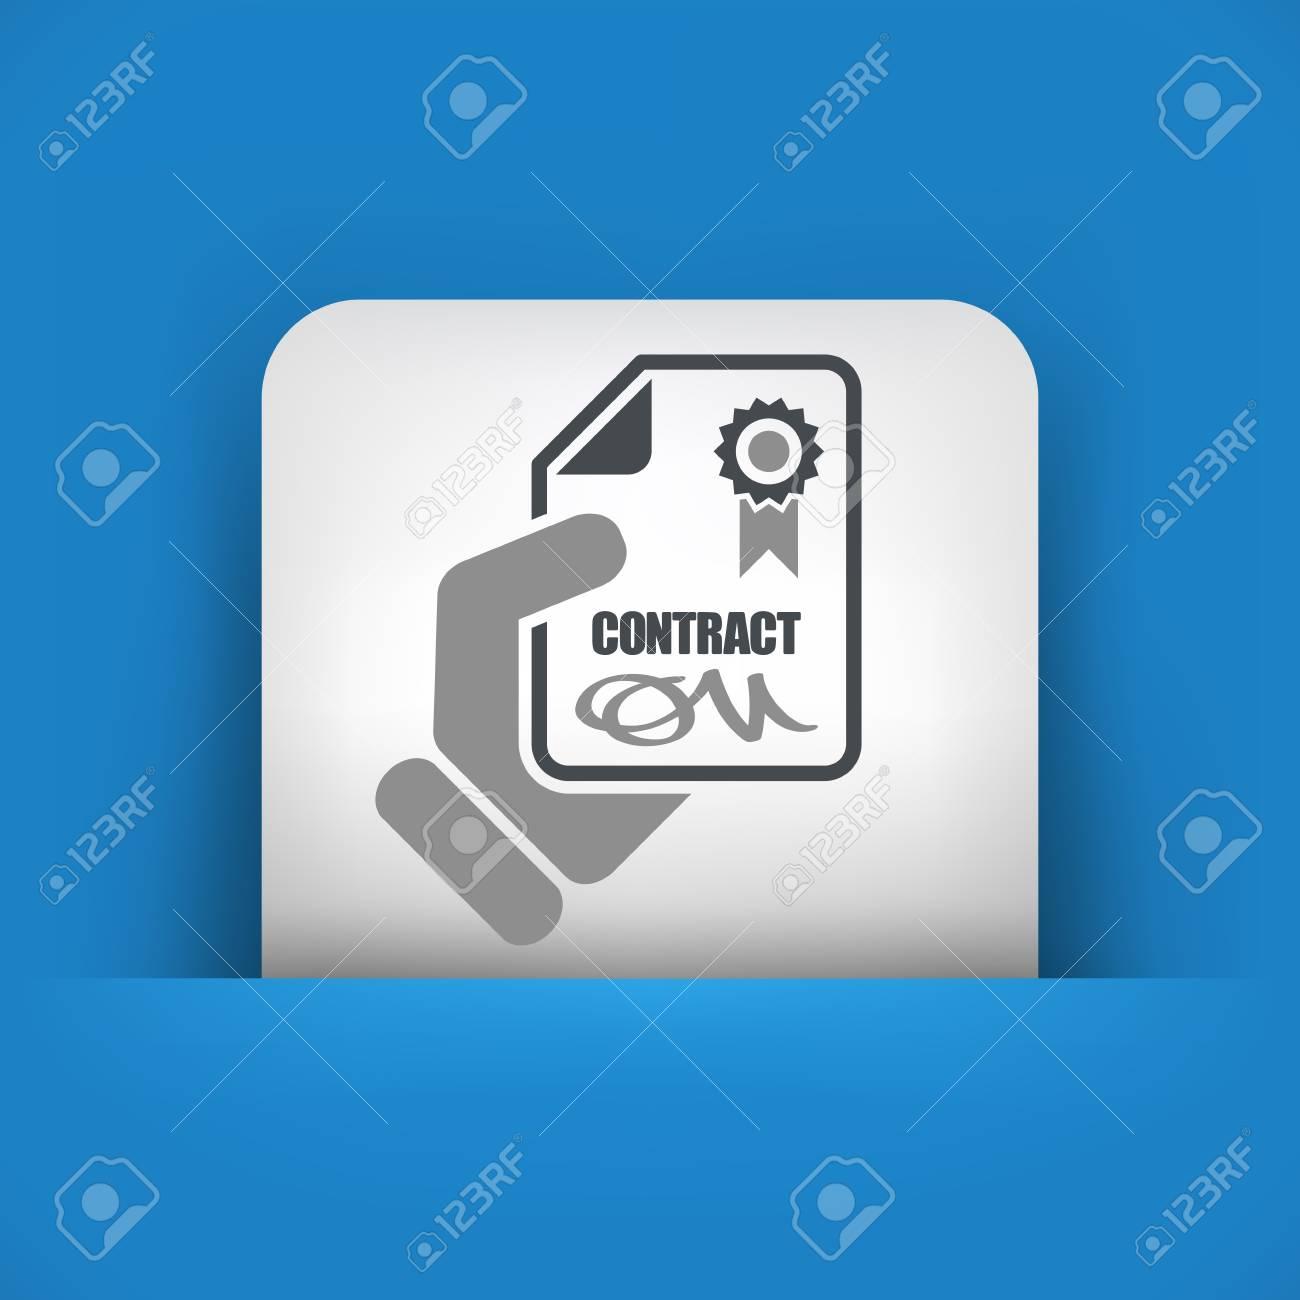 Contract icon Stock Vector - 26767930